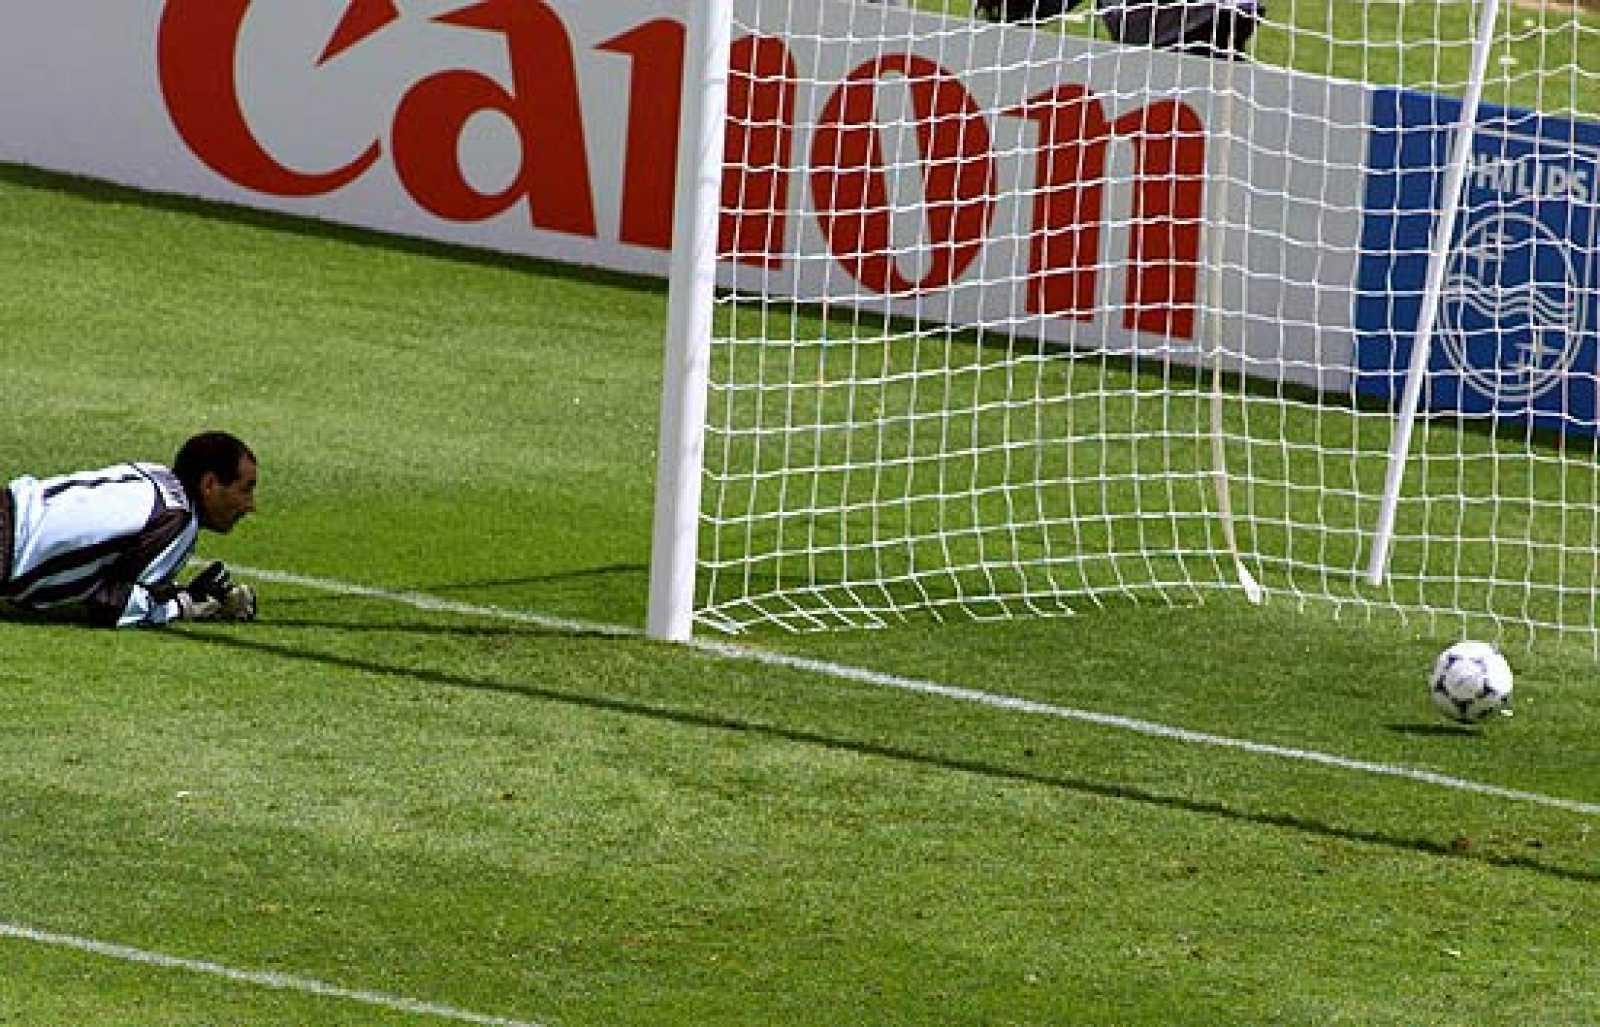 Gol involuntario de Zubizarreta